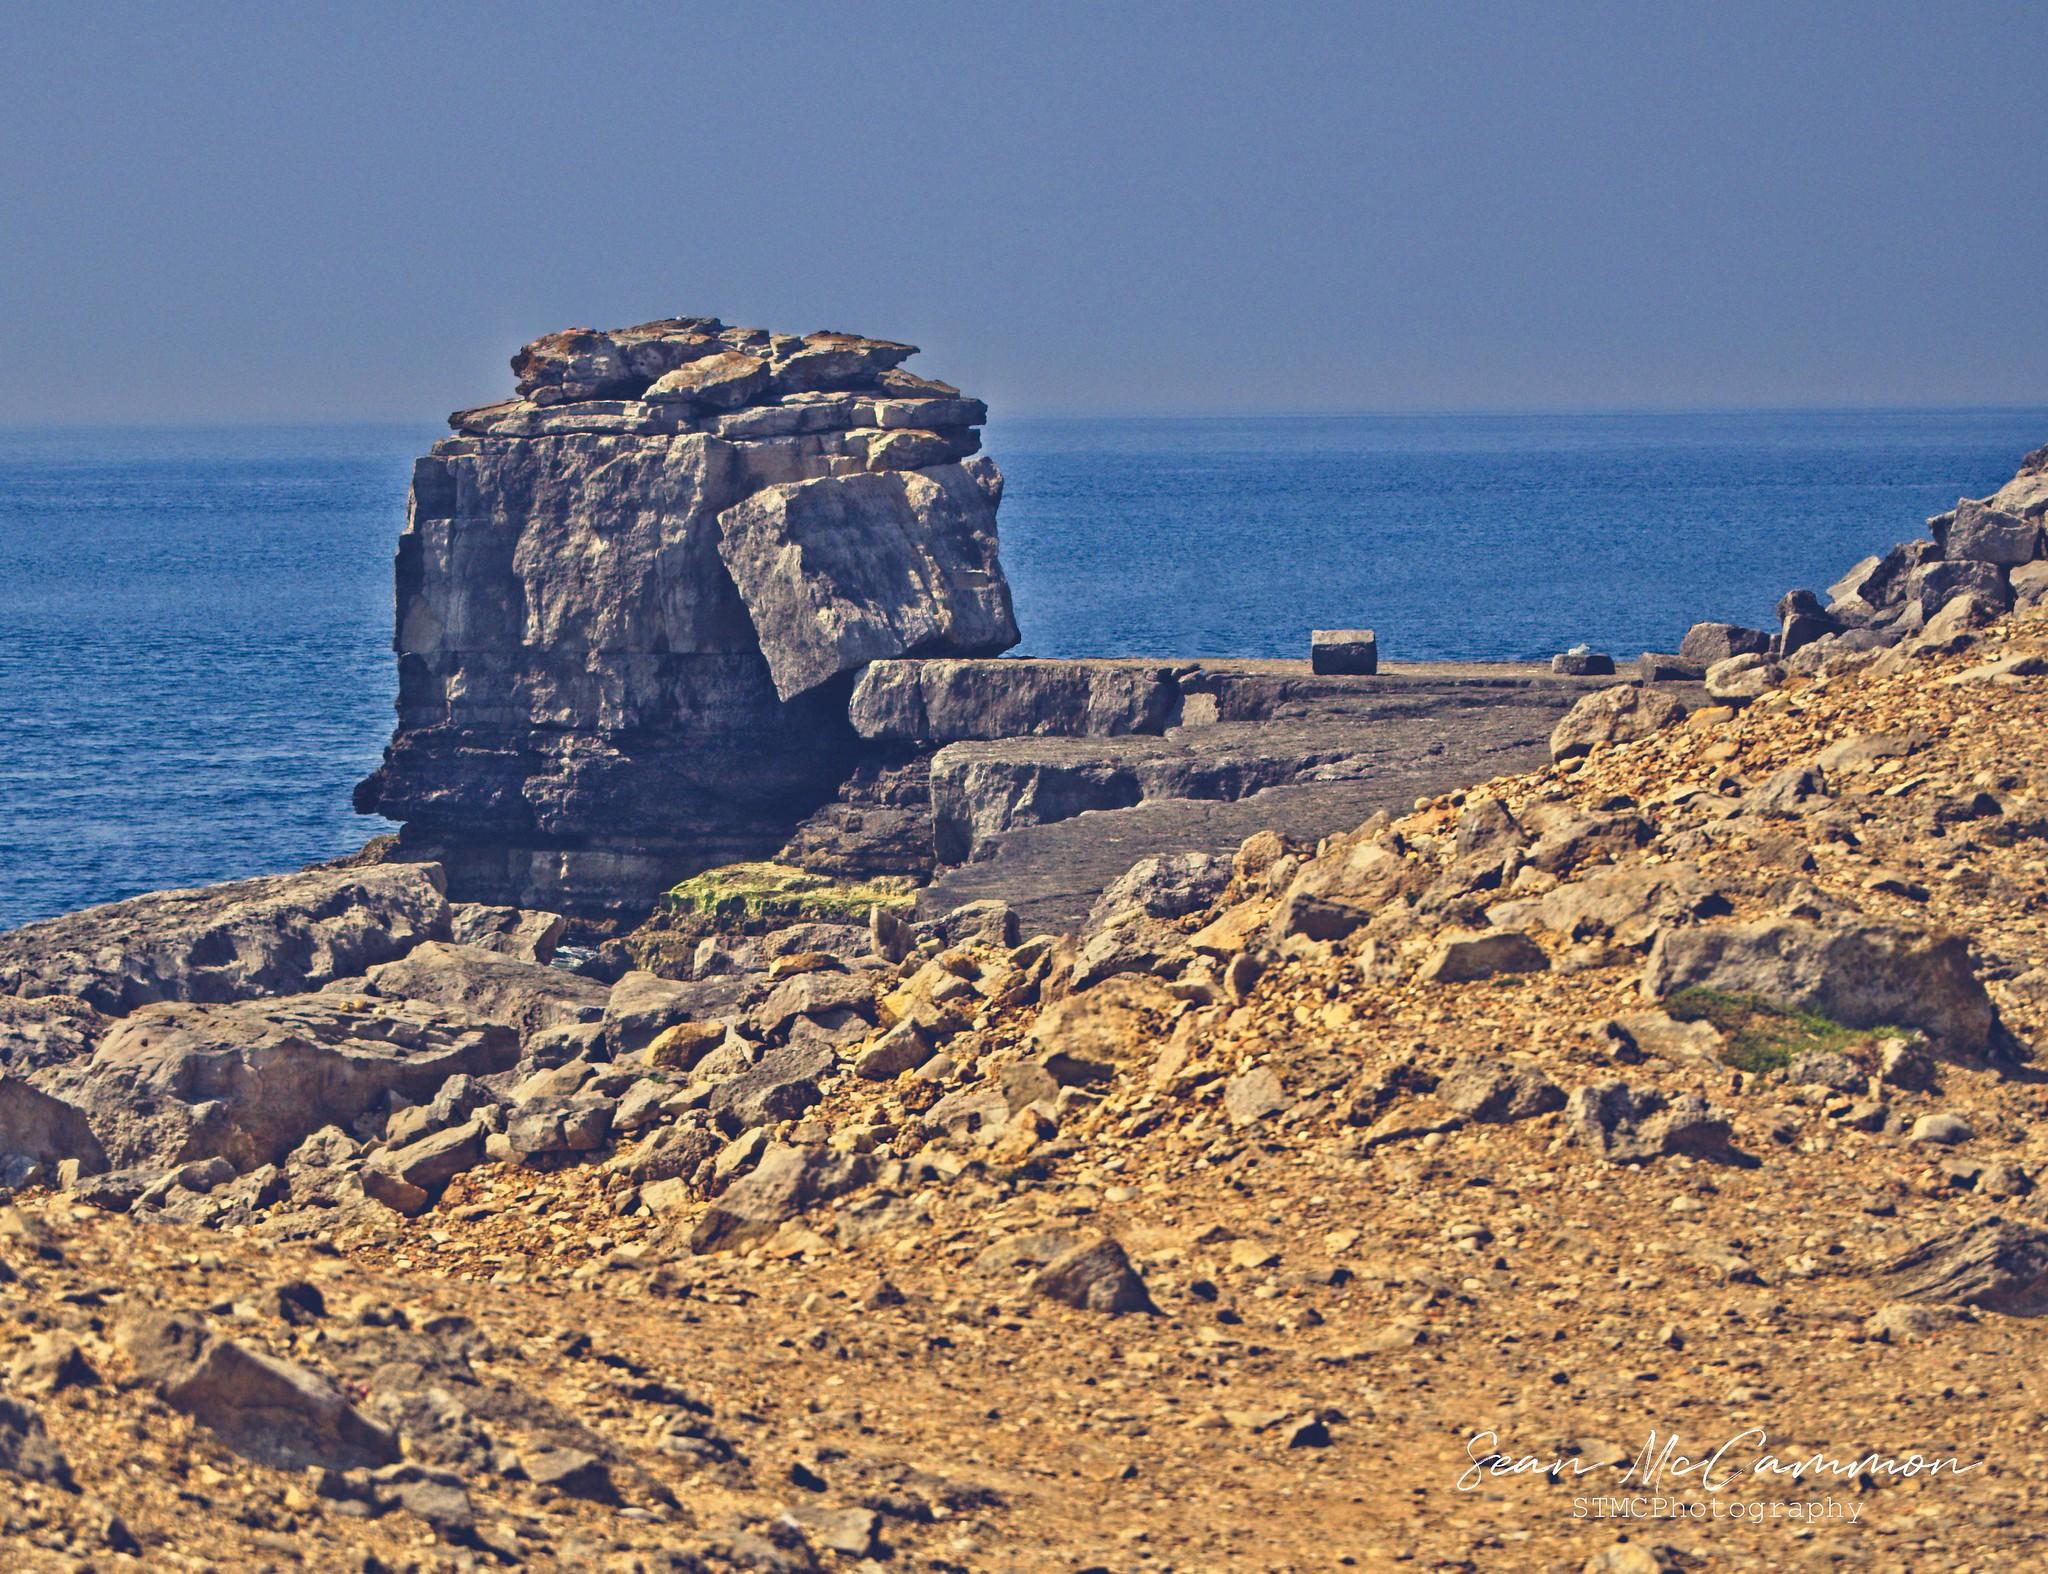 The Jurassic Coast